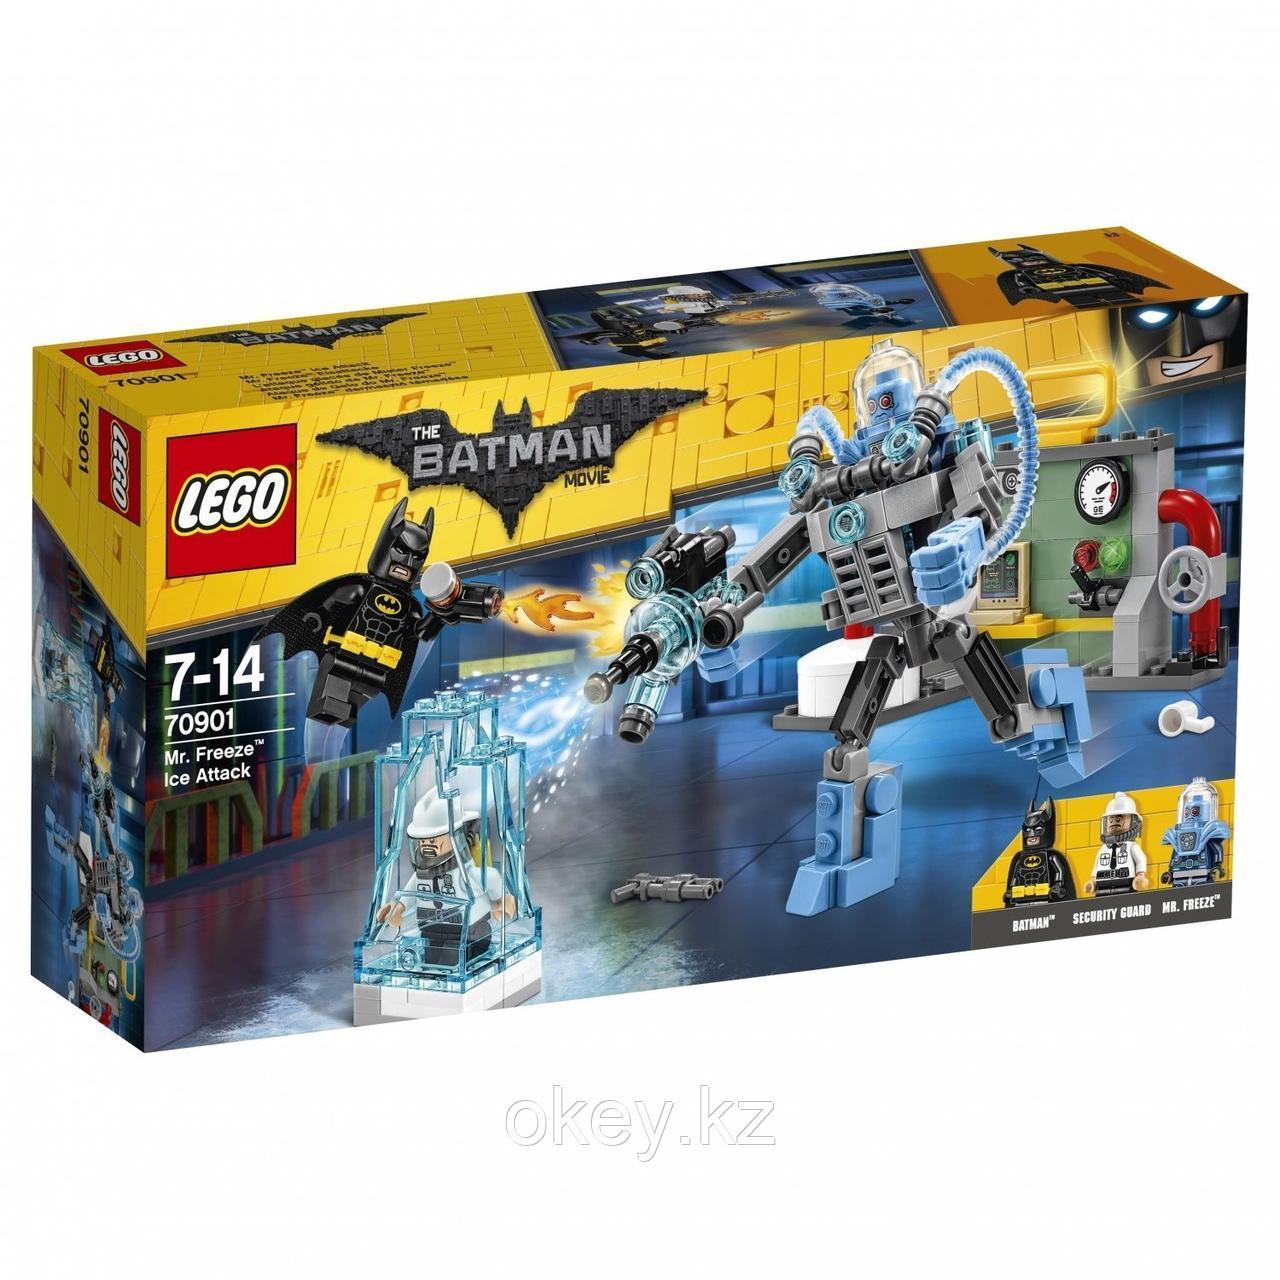 LEGO Batman Movie: Ледяная aтака Мистера Фриза 70901